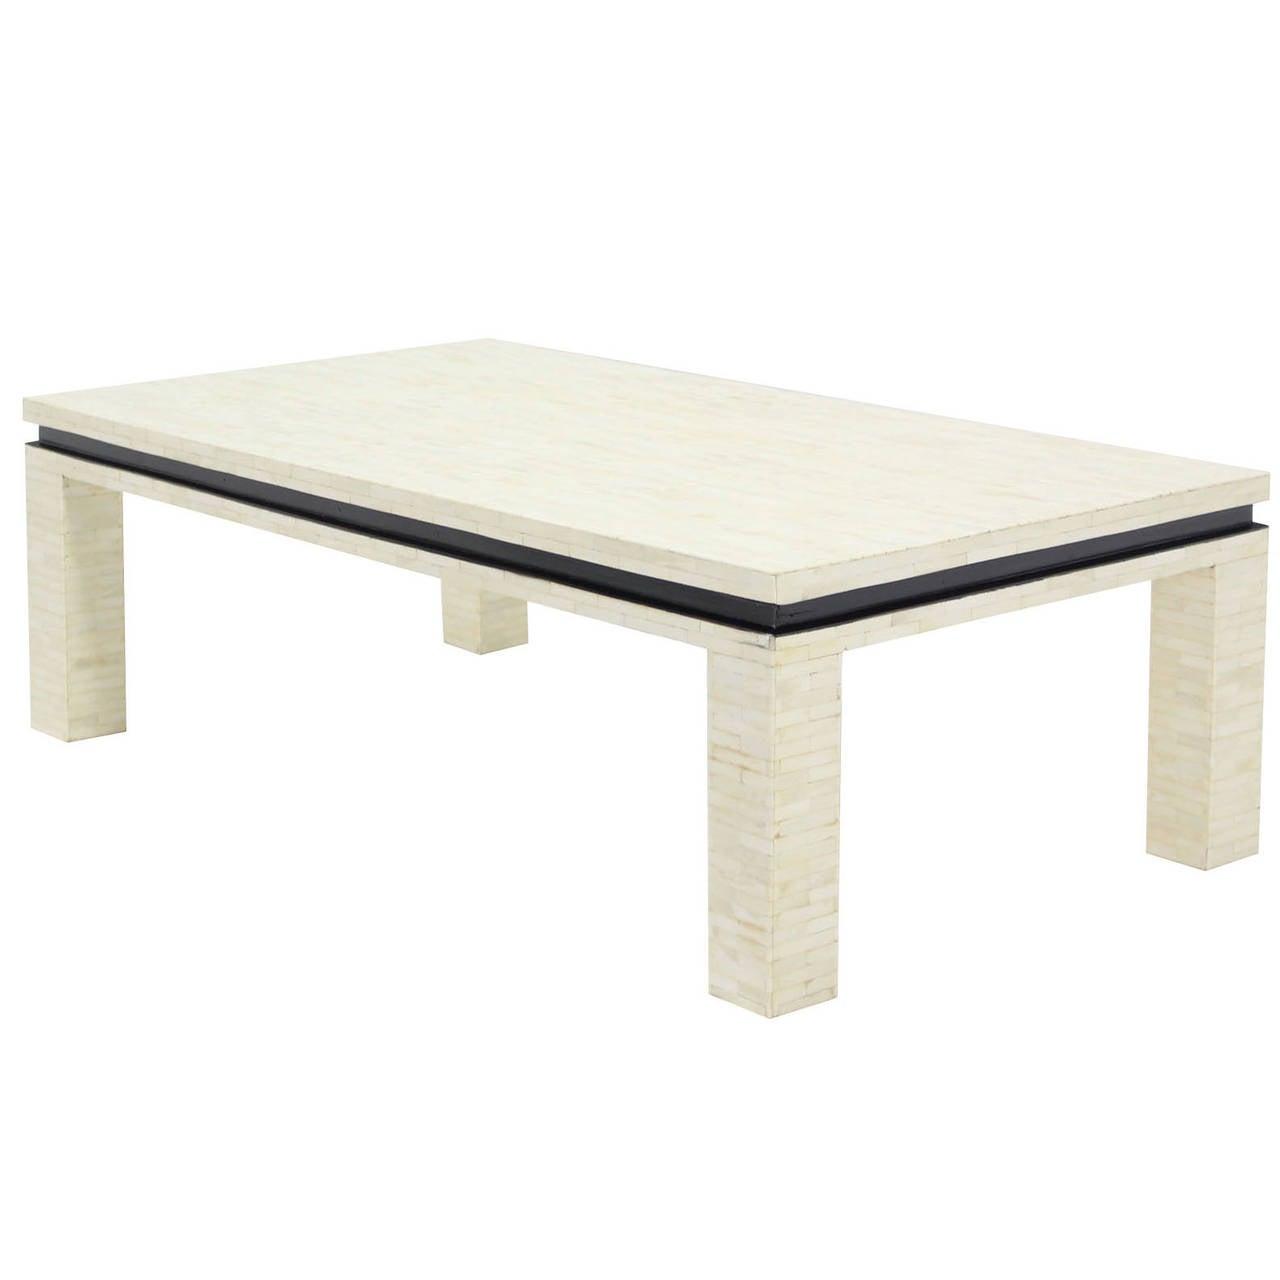 bone tile rectangle coffee table at 1stdibs